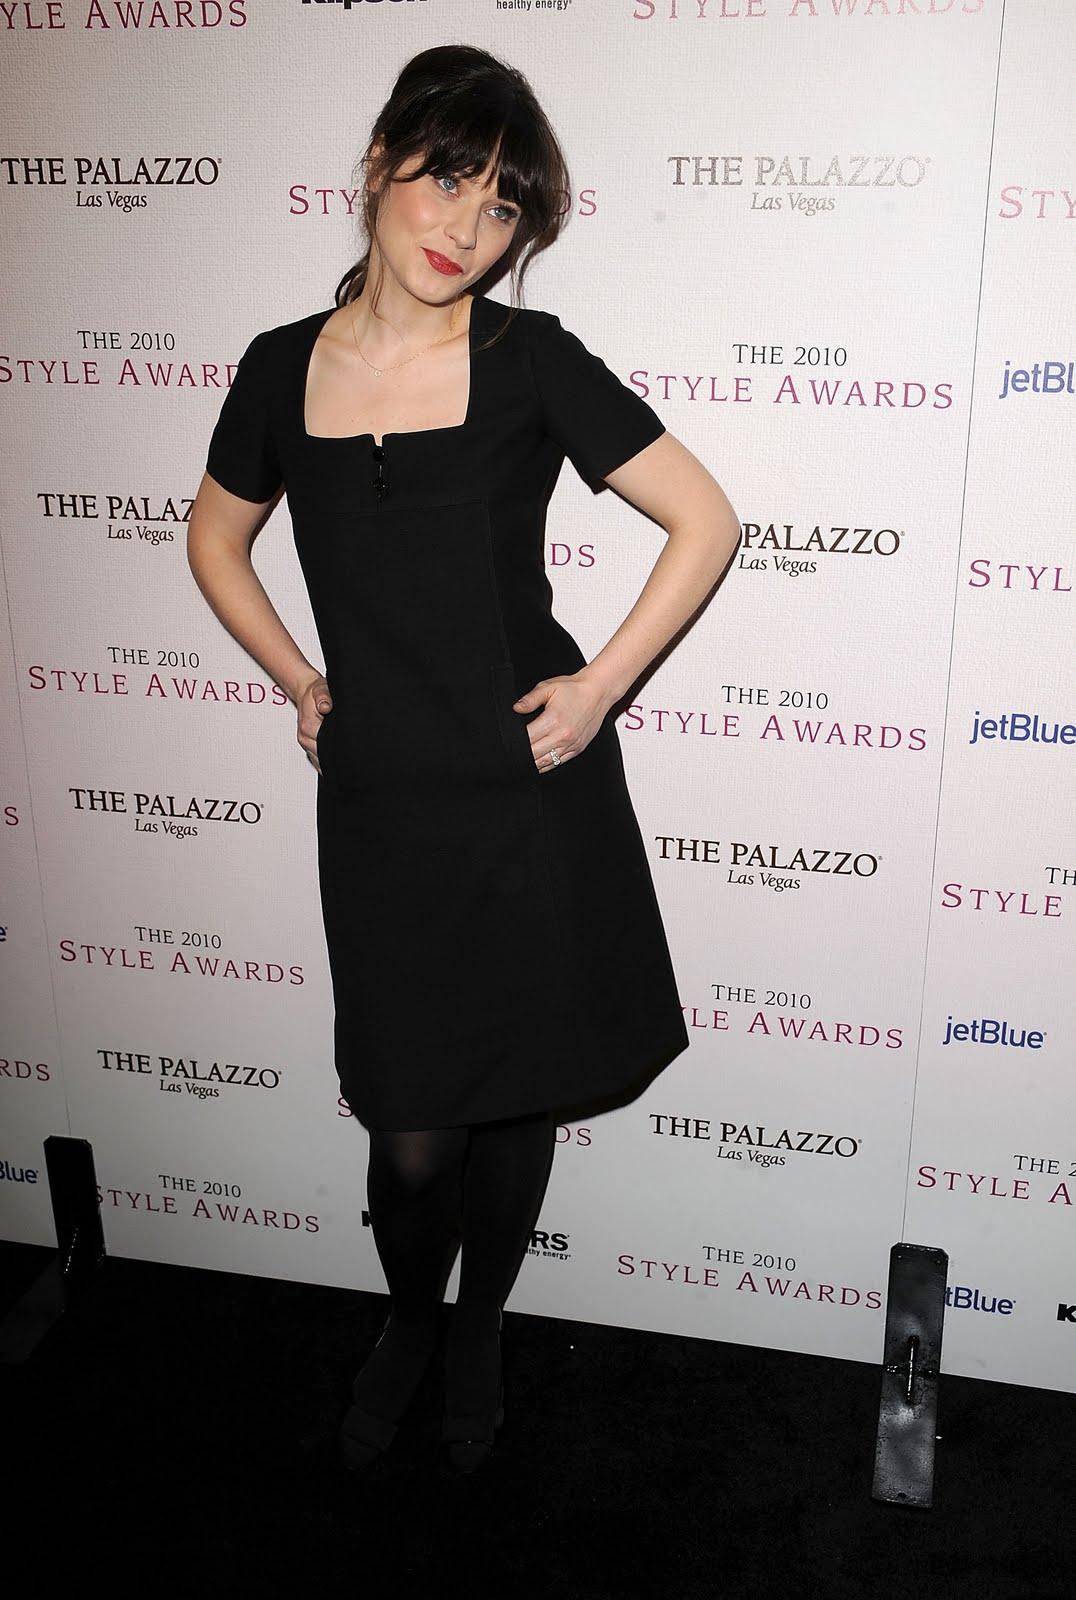 http://4.bp.blogspot.com/-6FWwp02b5pM/TYK3piK97aI/AAAAAAAA90Y/3ix2NwGCS58/s1600/44340_Tikipeter_Zooey_Deschanel_2010_Hollywood_Style_Awards_019_122_106lo.jpg